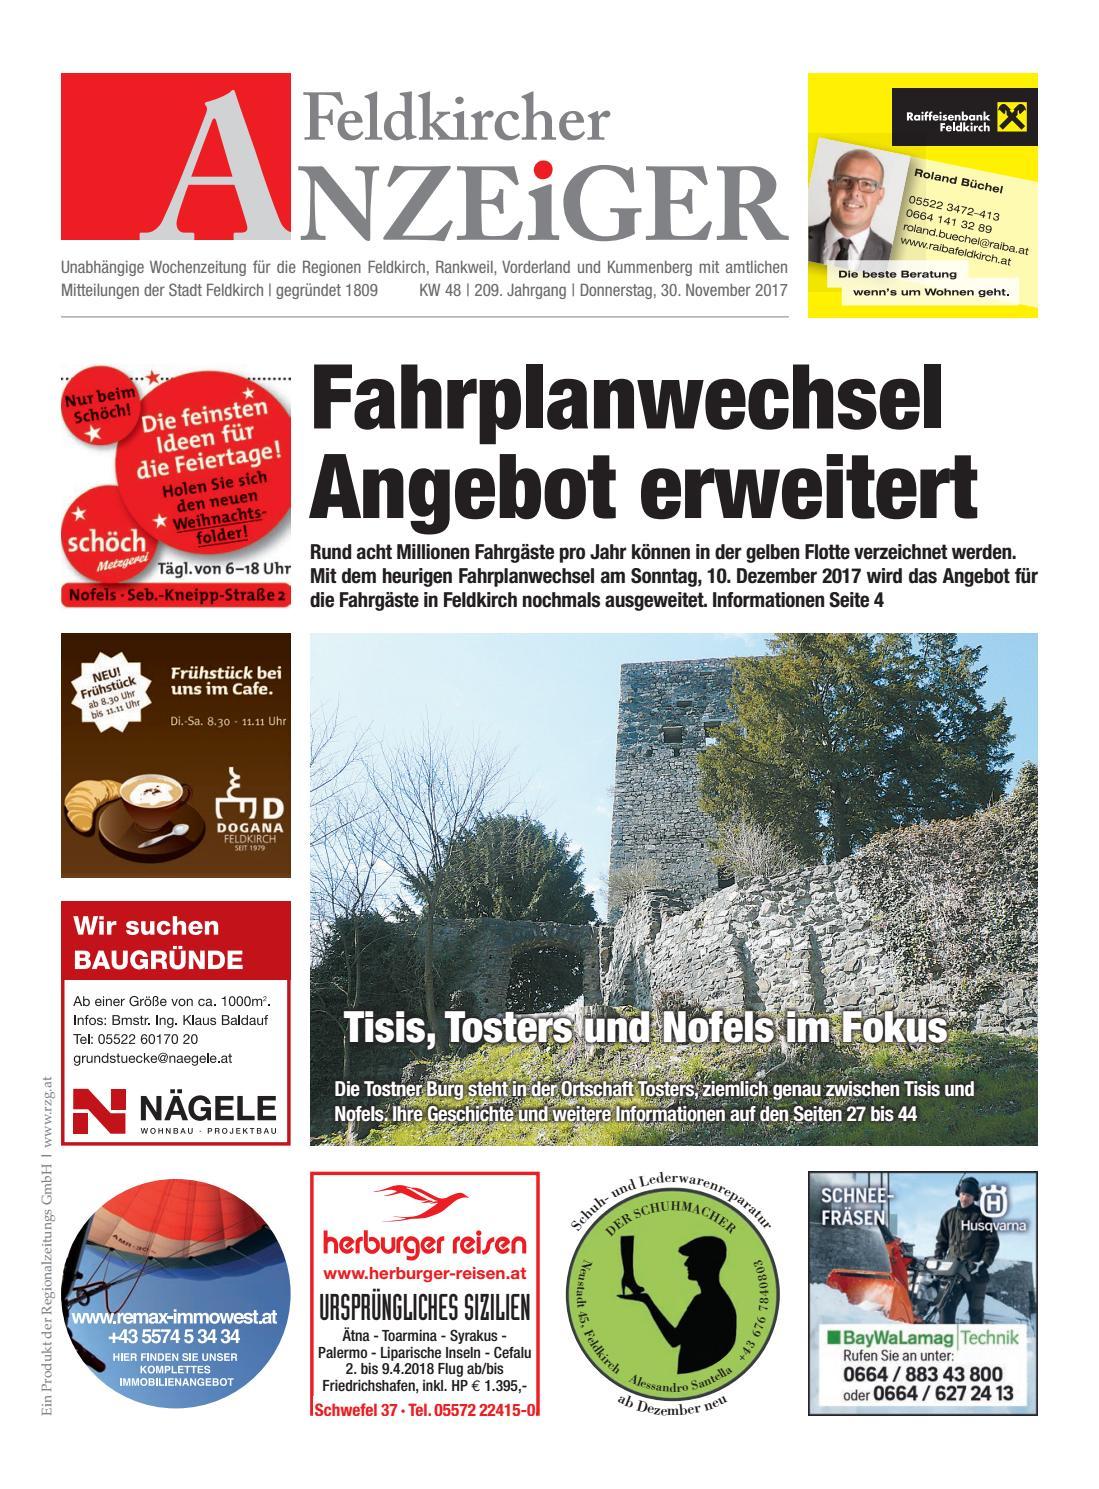 Bekanntschaften in Feldkirch - Partnersuche & Kontakte